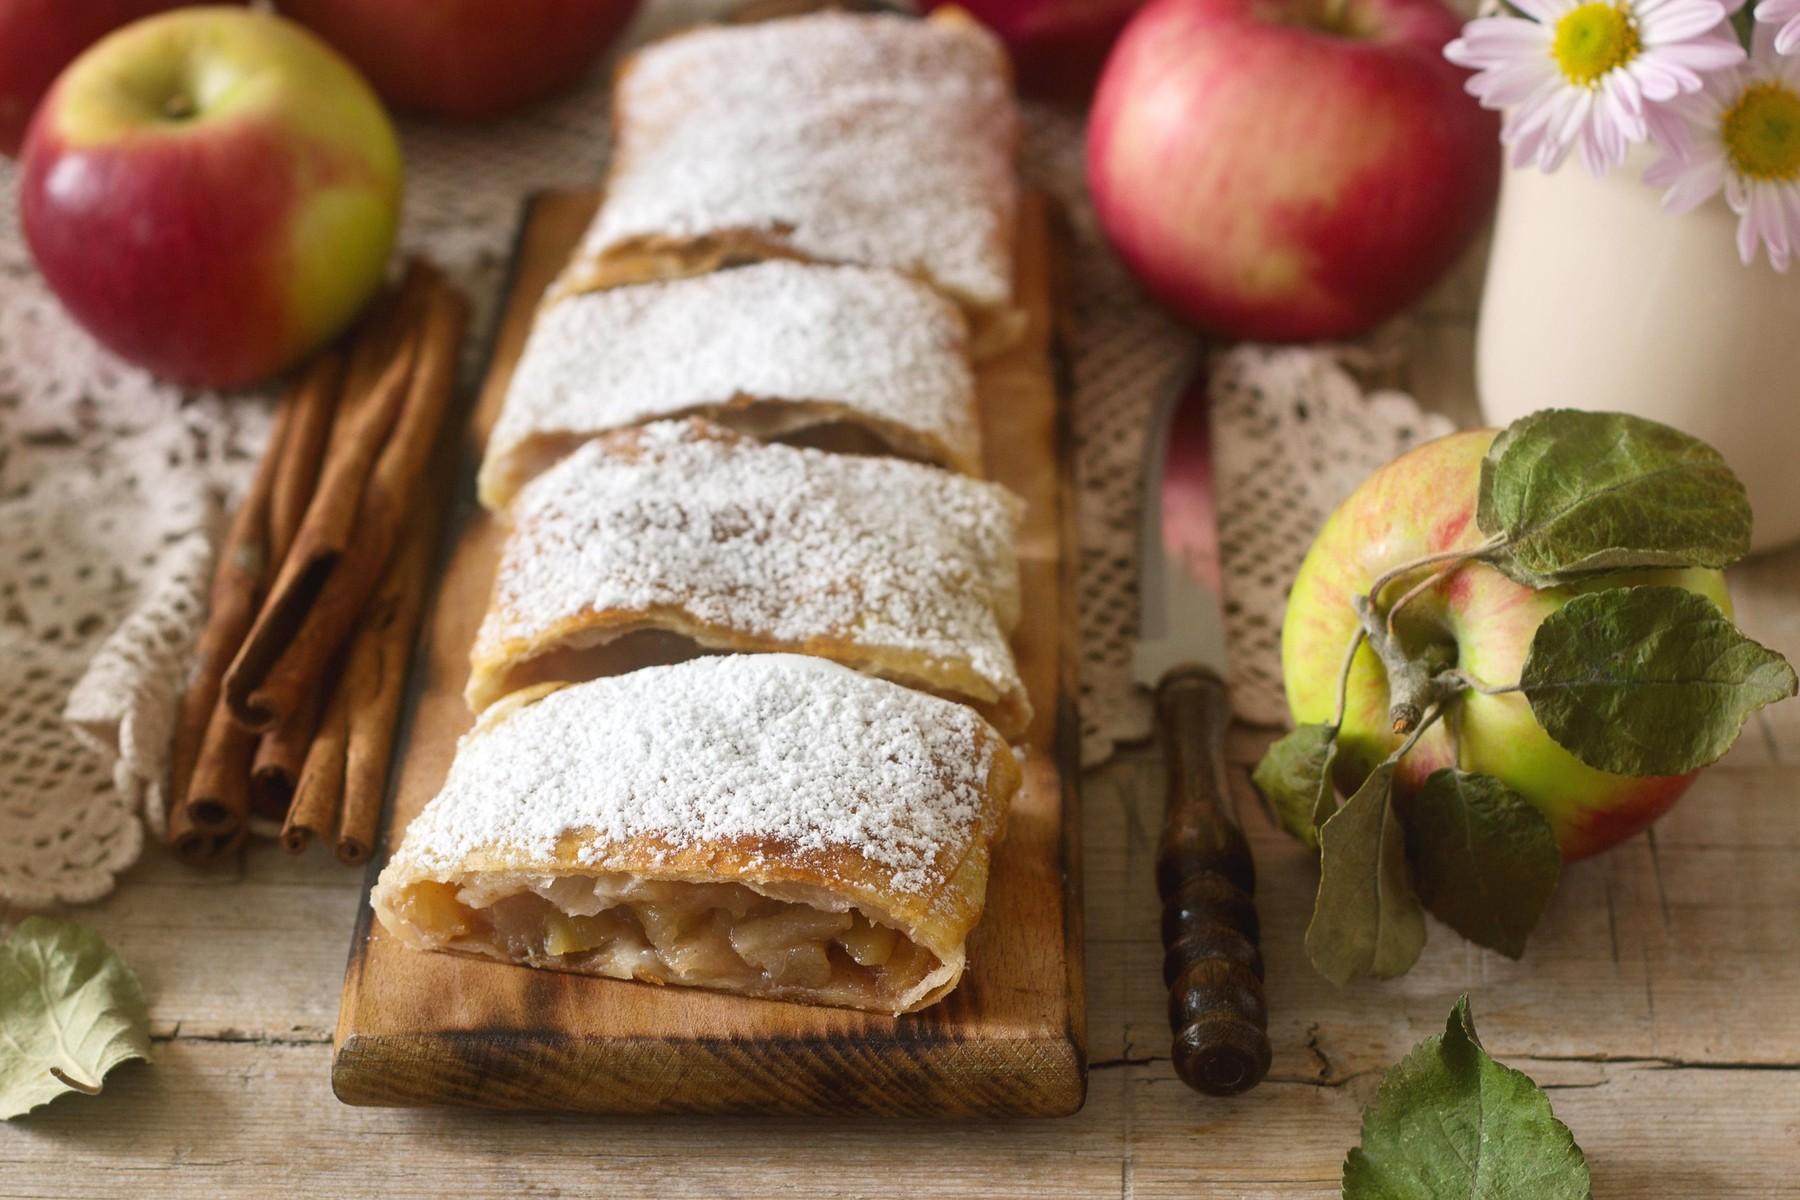 Jabolčni štrudelj